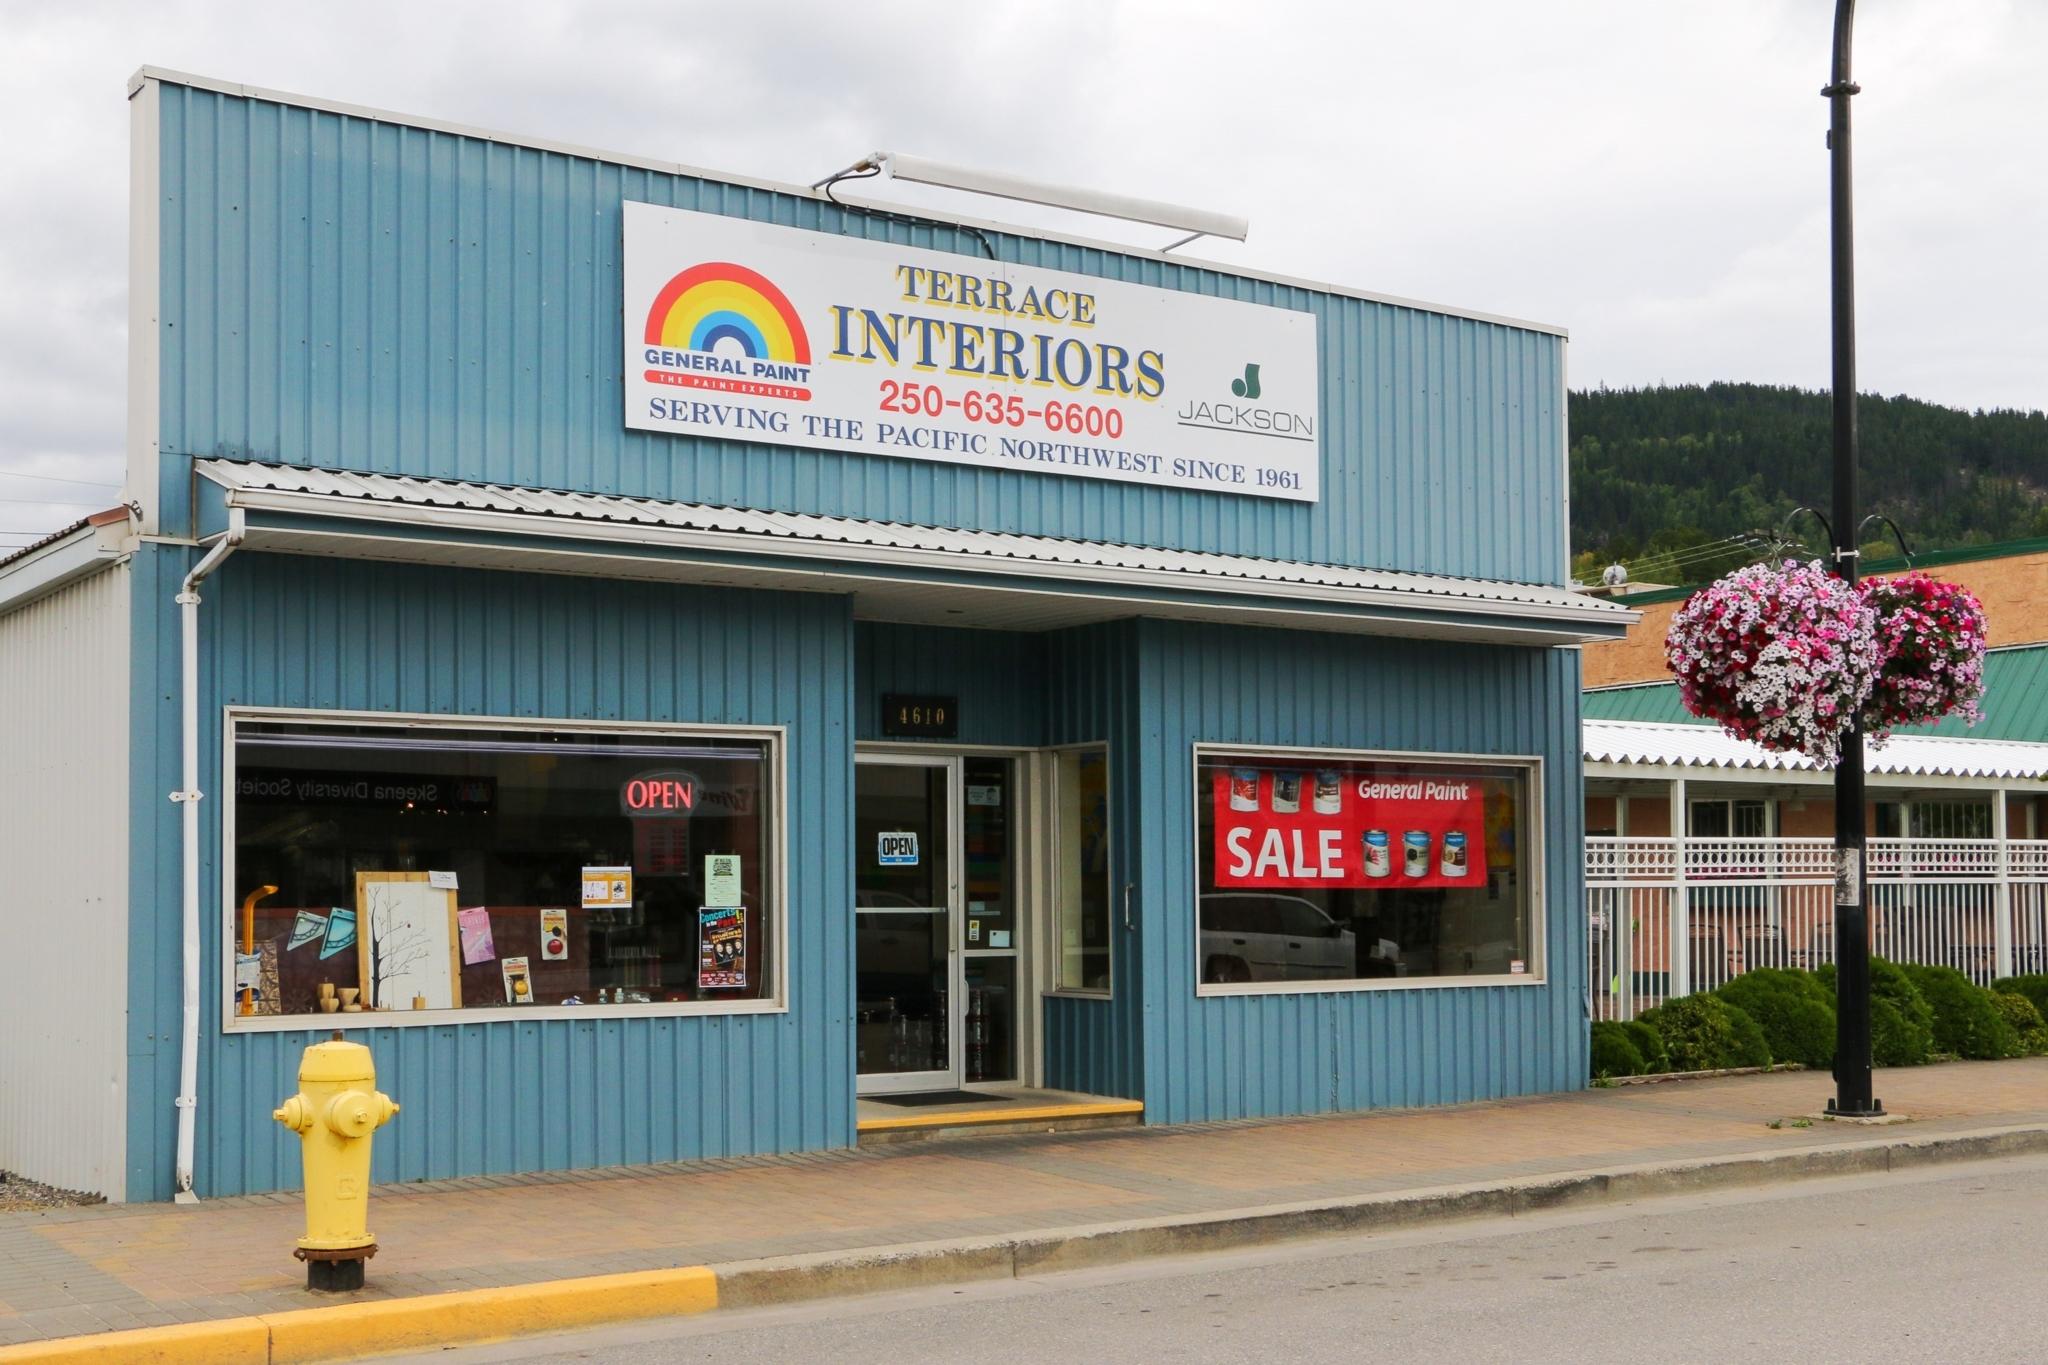 Terrace Interiors Ltd in Terrace